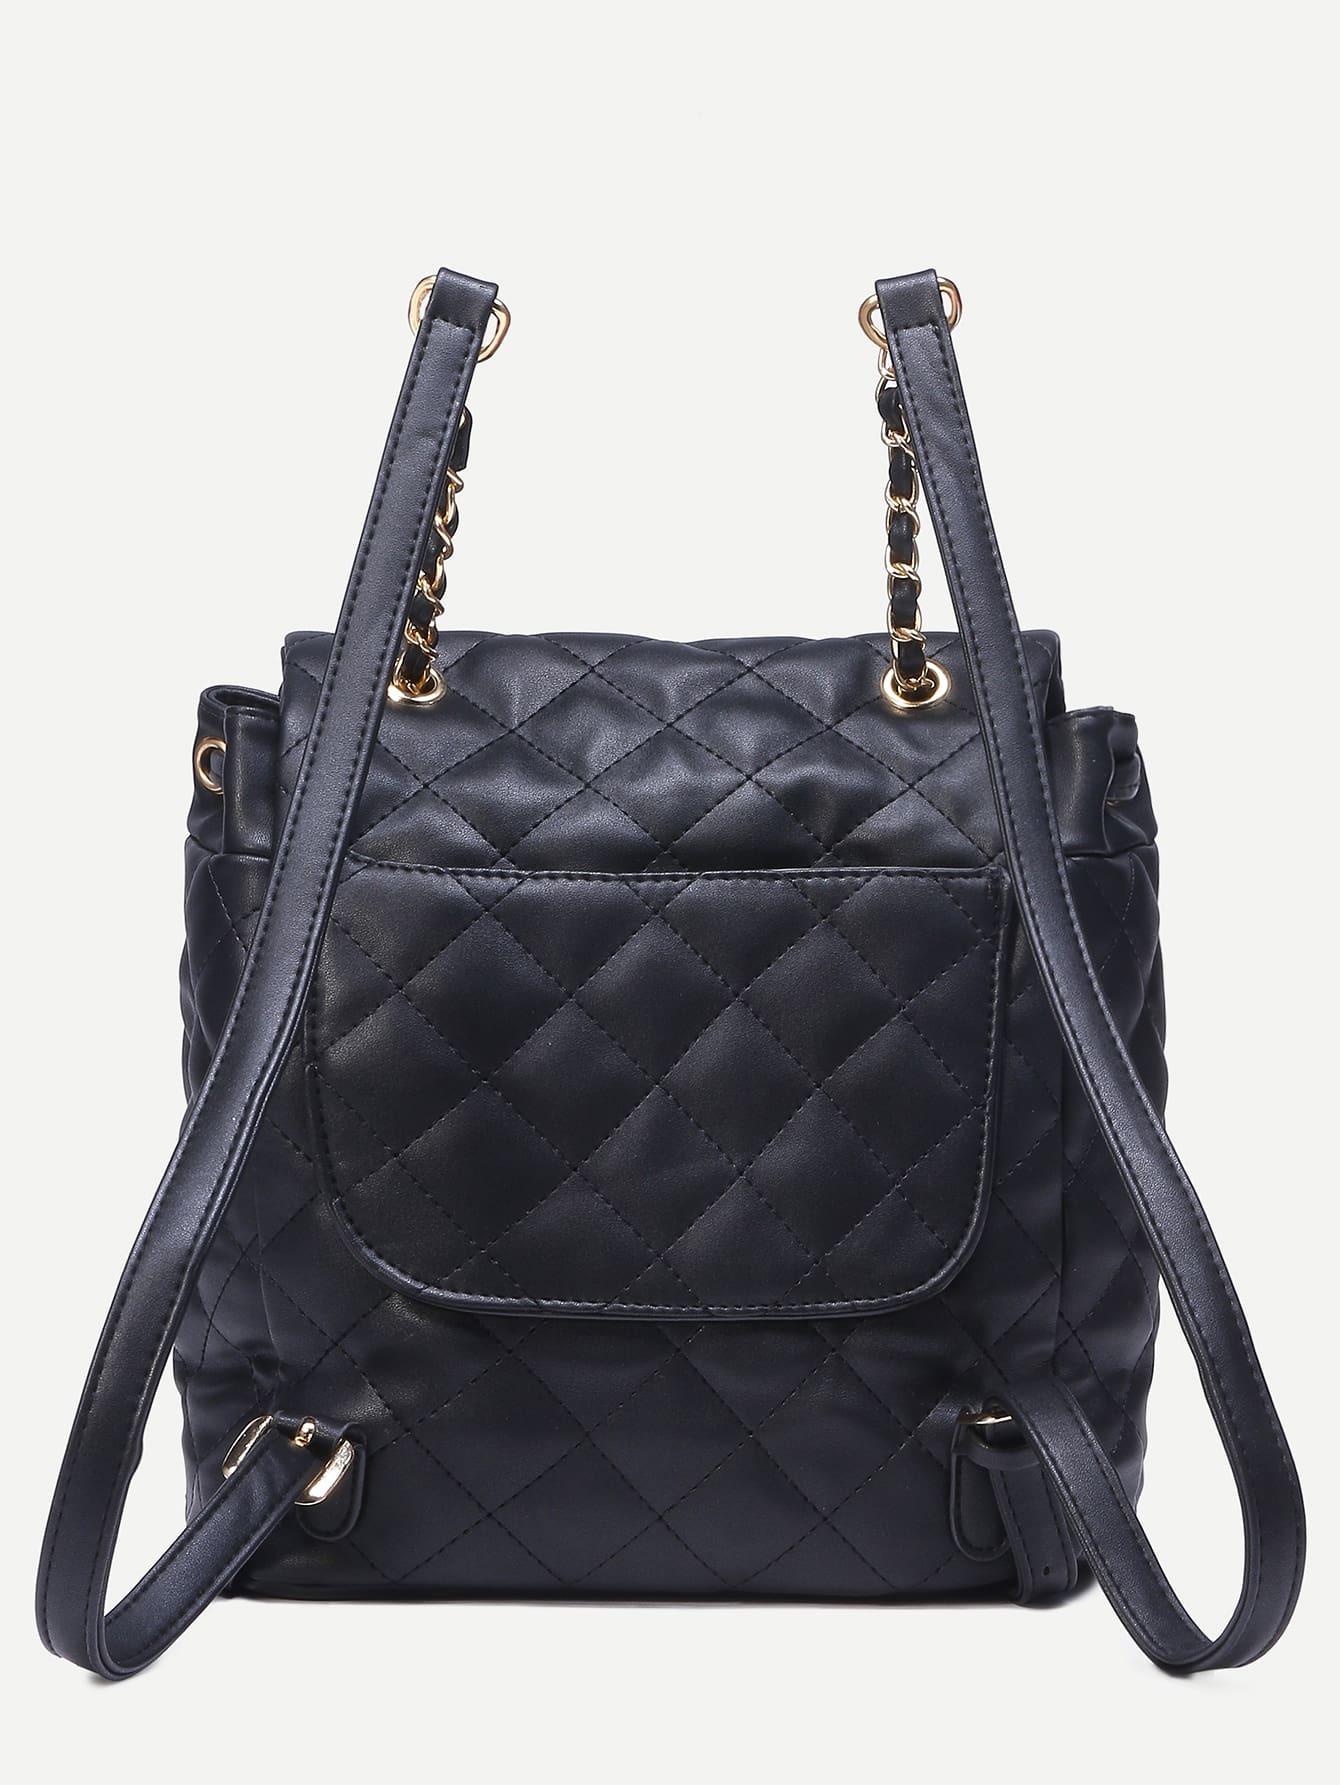 bag160808302_2